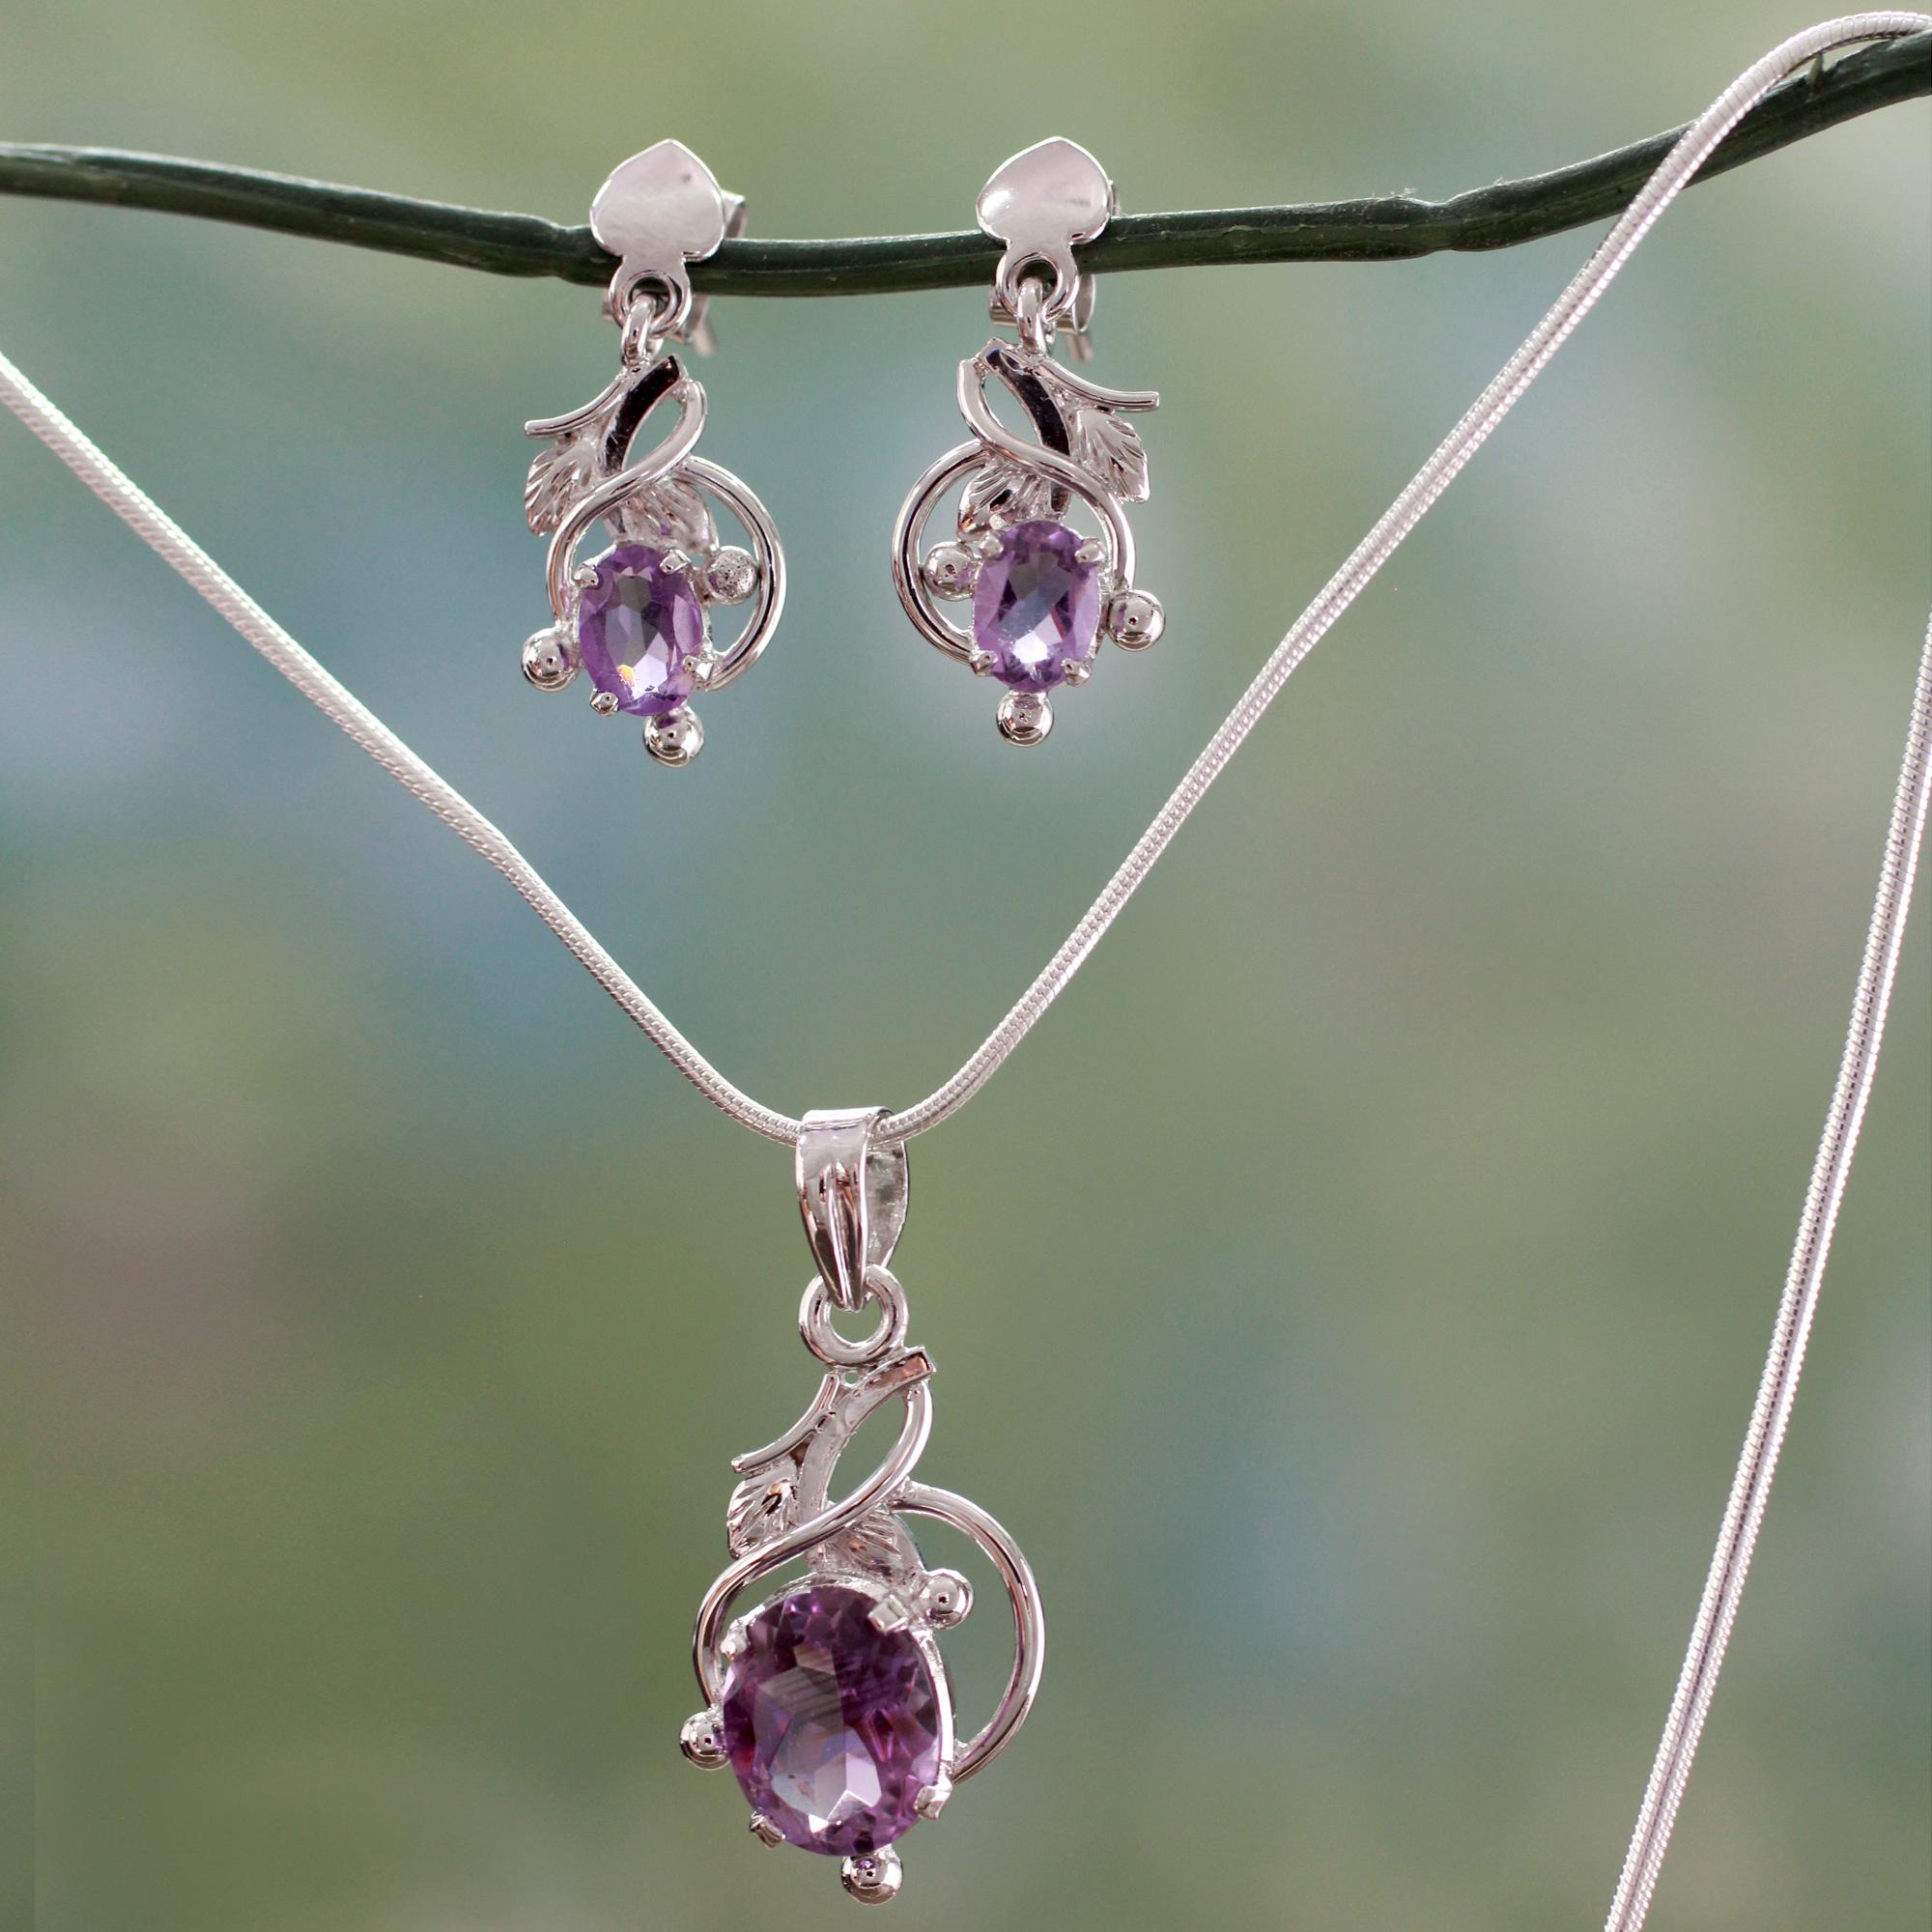 Indian Sterling Silver & Amethyst Floral Necklace & Earrings, 'Amethyst in  Bloom'